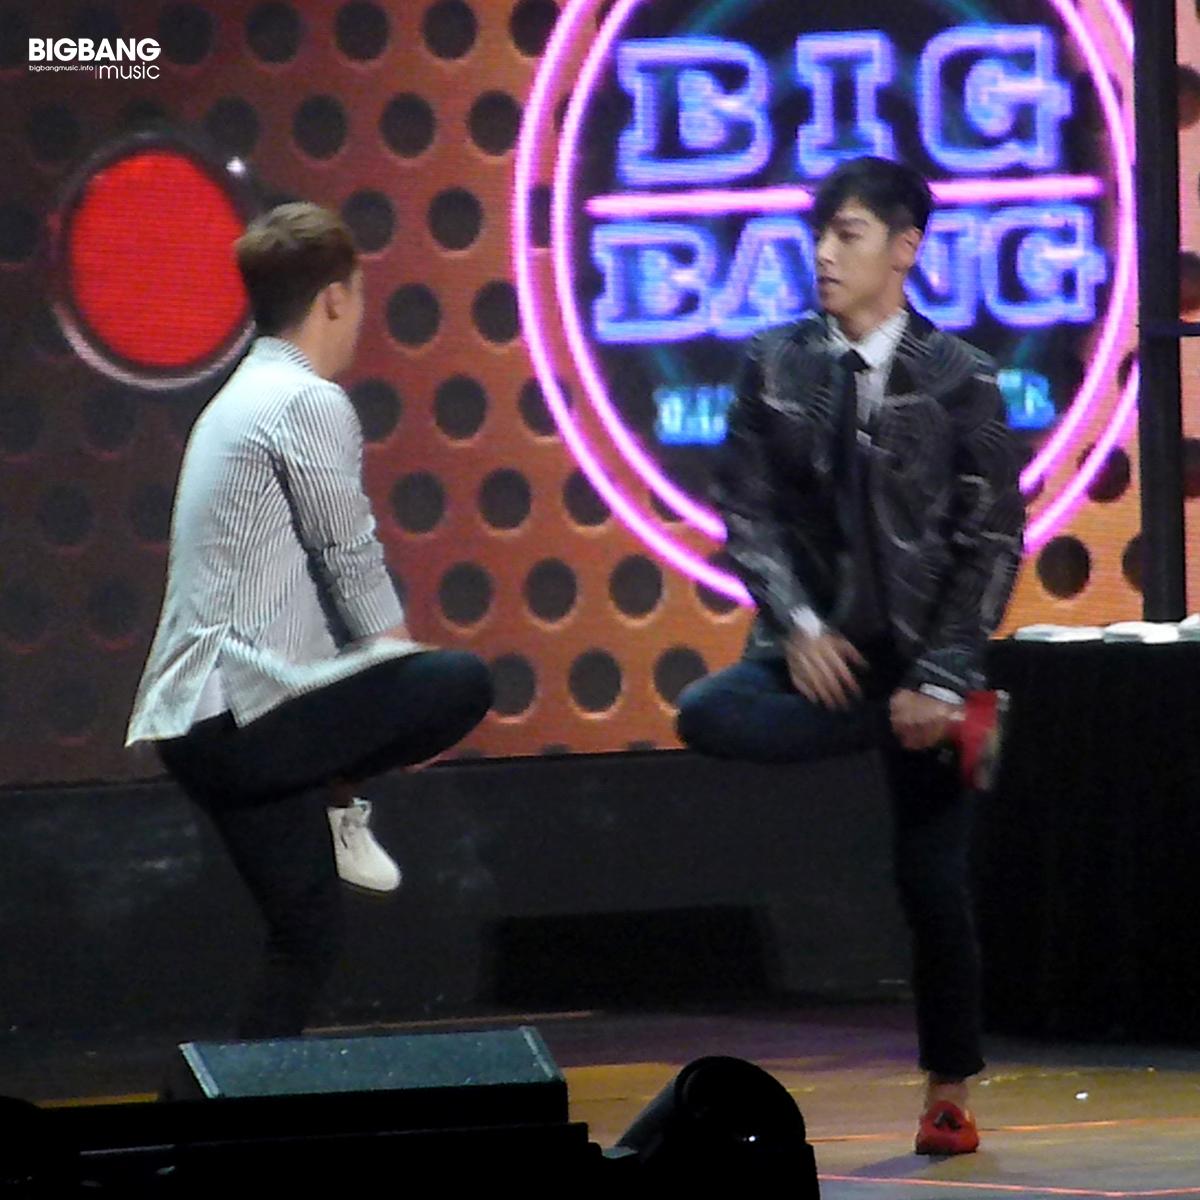 BBMusic-BIGBANG_FM_Beijing_Day3_2016-07-17_15